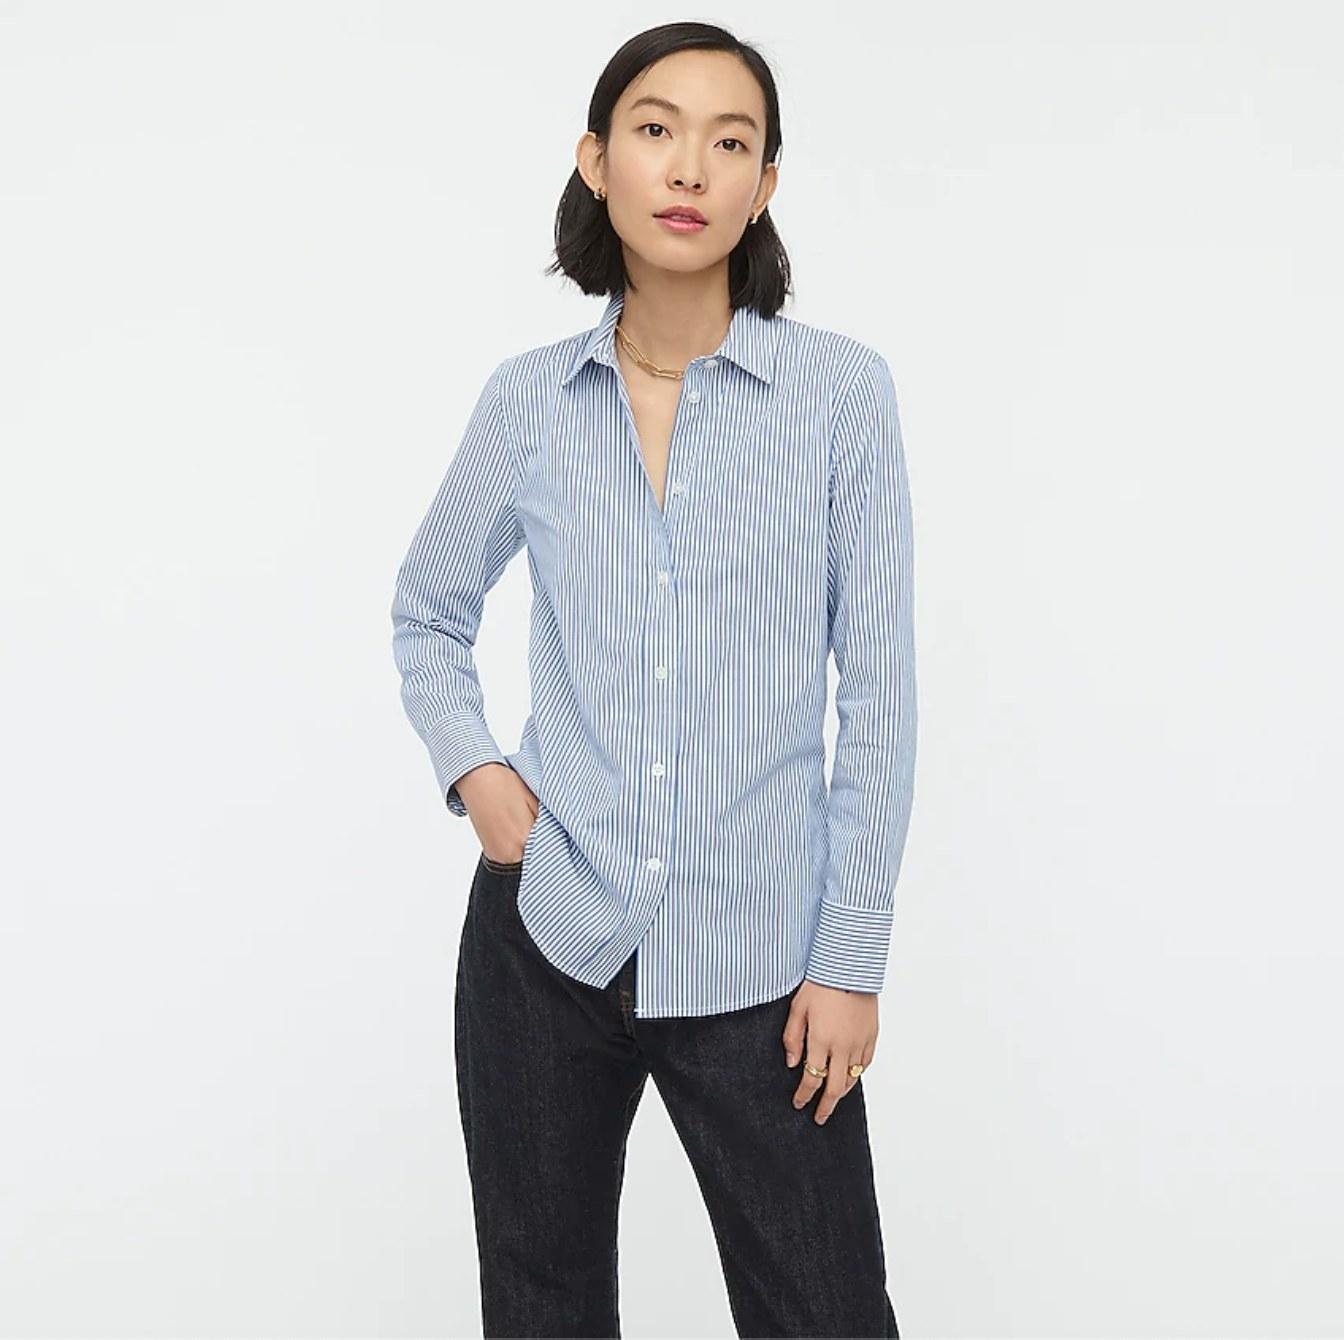 model in blue striped shirt